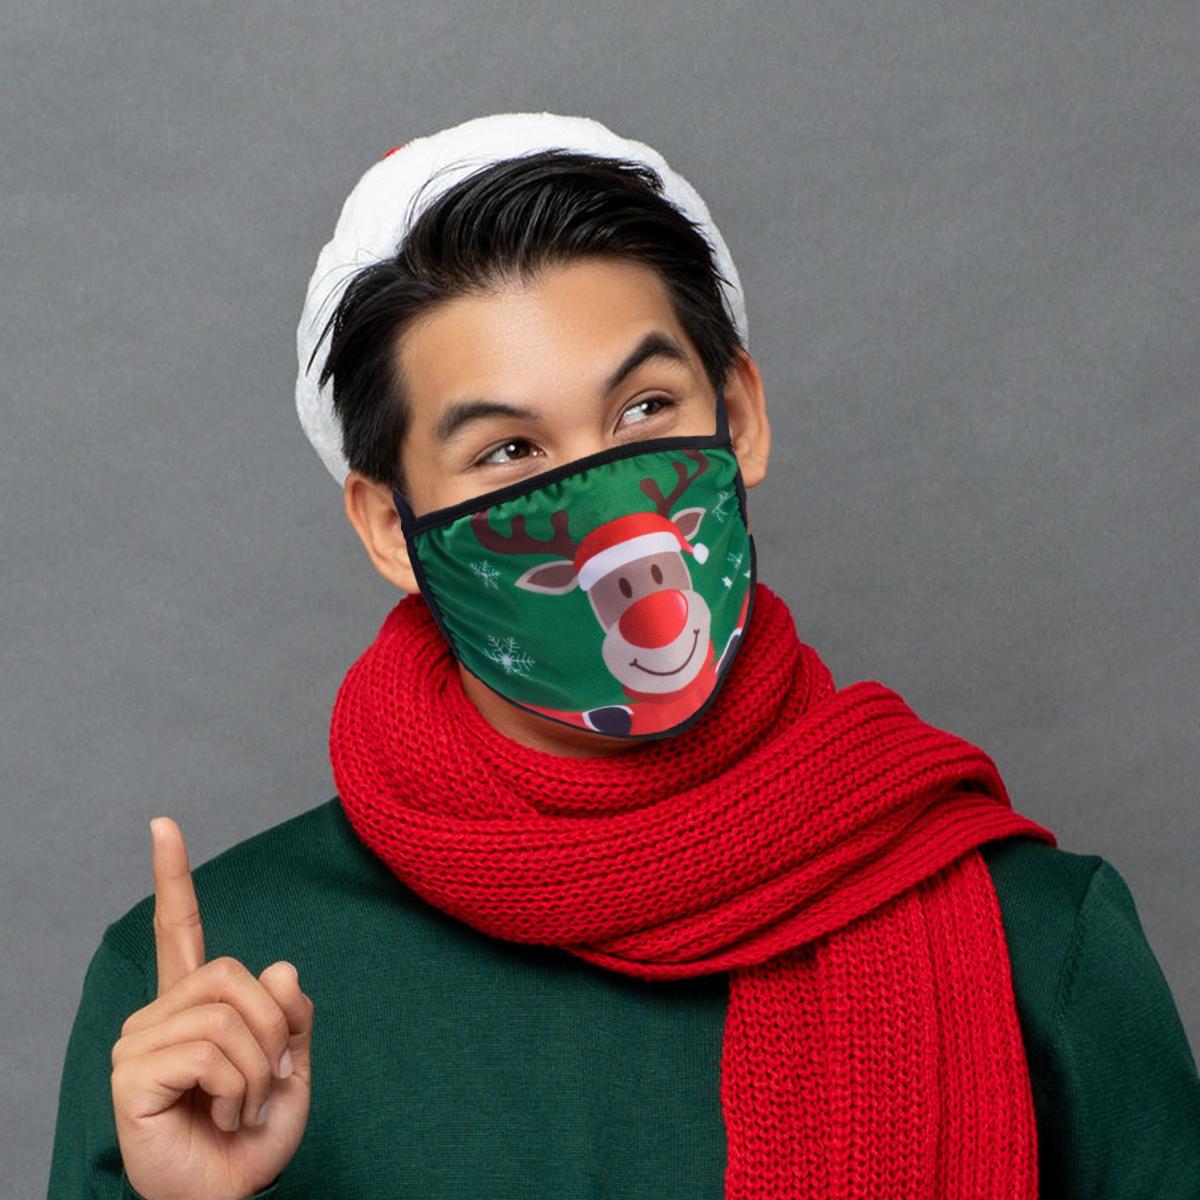 IAG-Light-Up-Holiday-Mask-LS-2-1200×1200